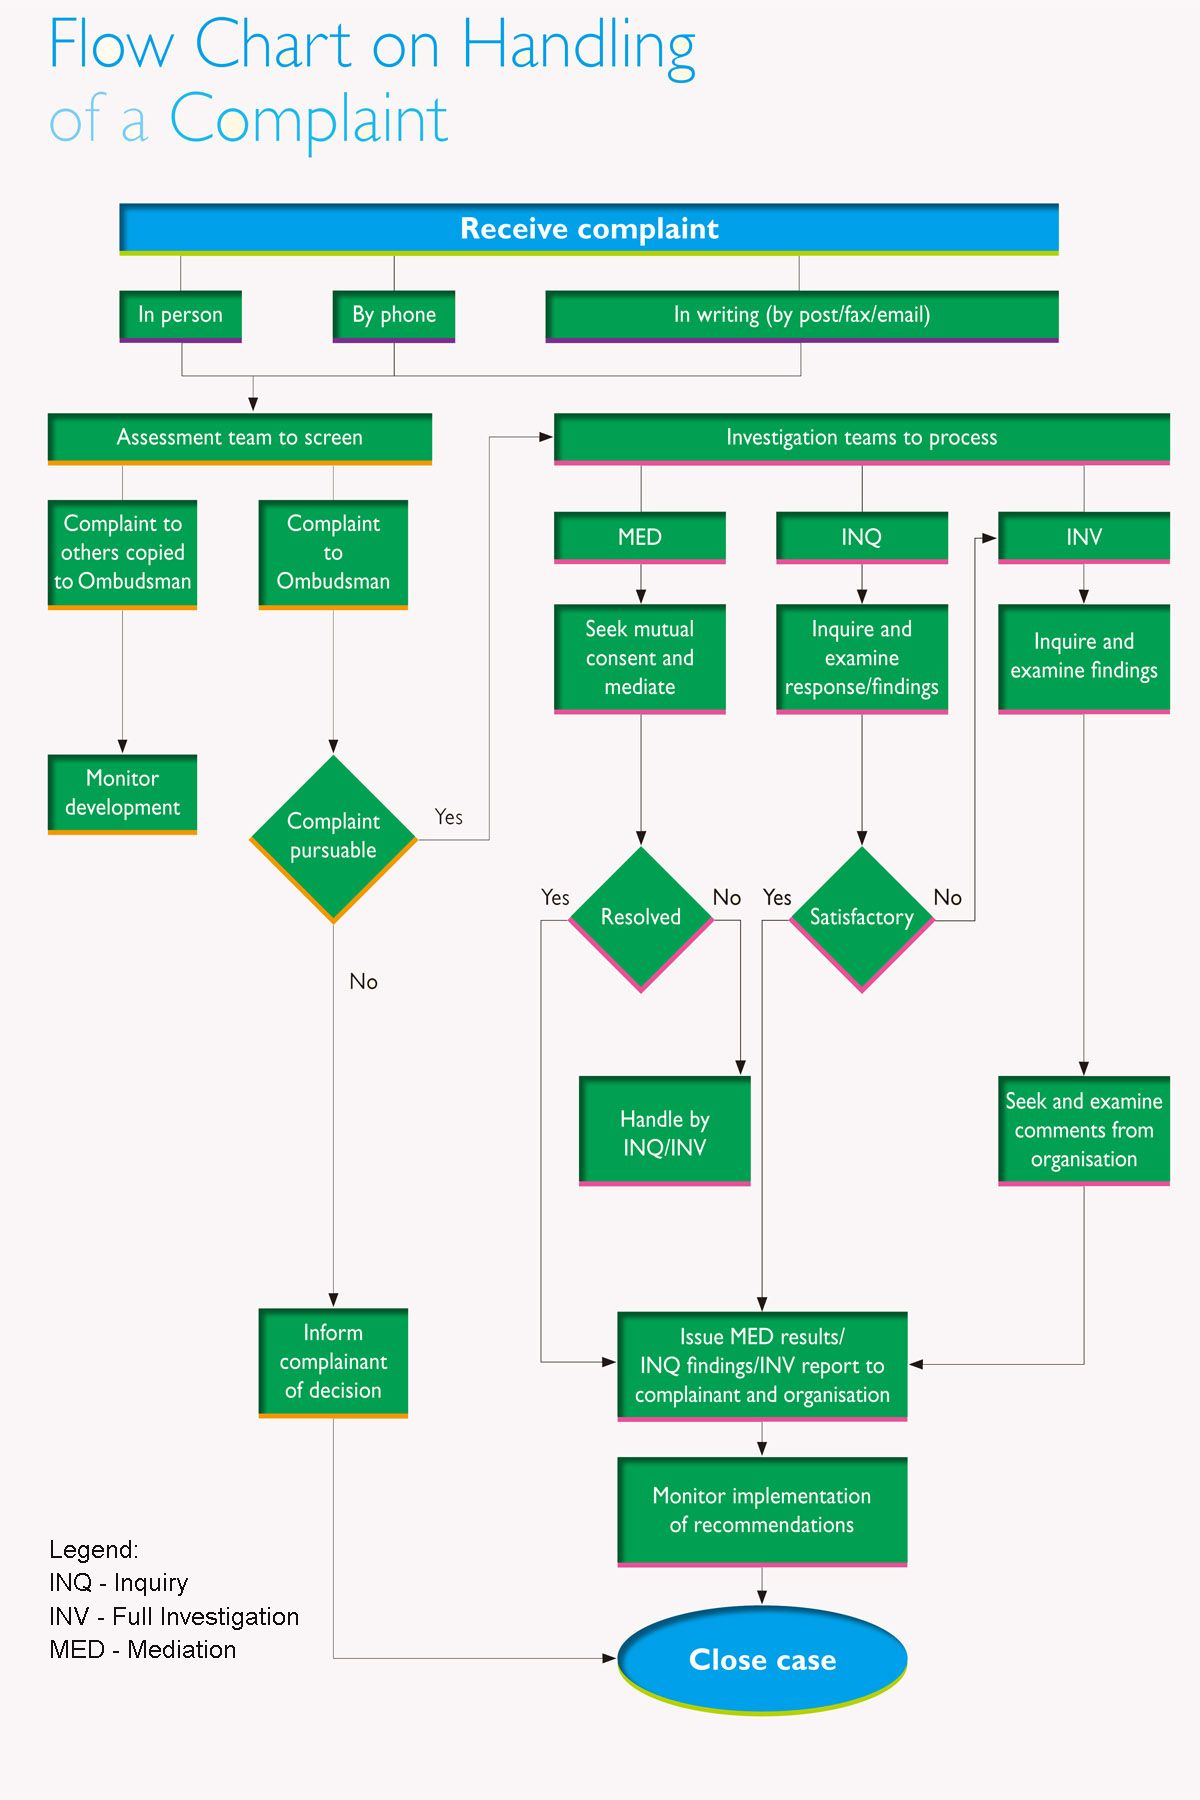 warehouse process flow diagram house wiring symbols pdf image result for flowchart complaint handling